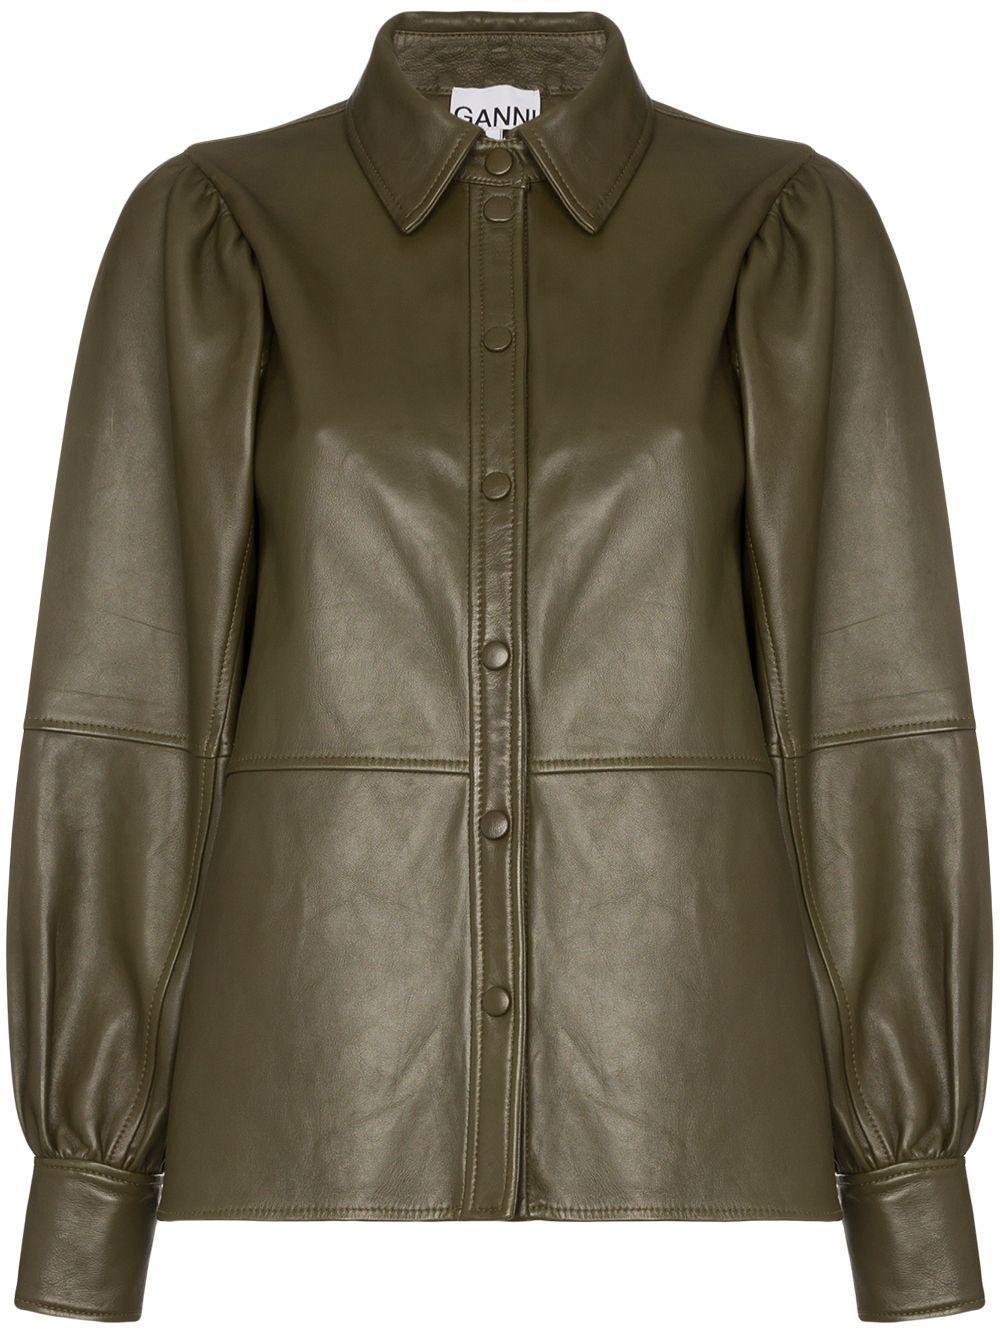 Ganni Leather Shirt Jacket Farfetch In 2020 Leather Jacket Style Leather Shirt Shirt Jacket [ 1334 x 1000 Pixel ]